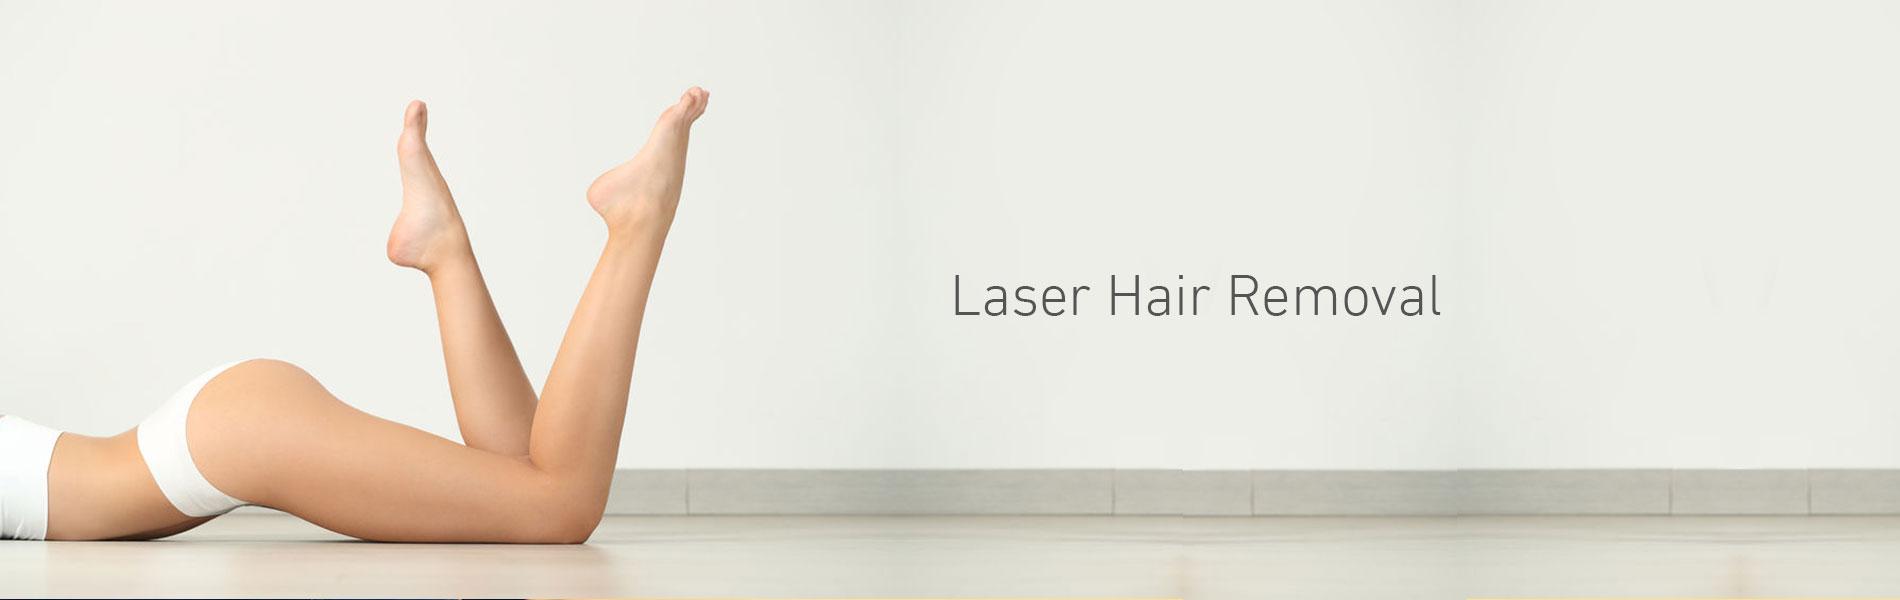 Laser Hair Removal Southampton Hampshire Aesthetics Clinics